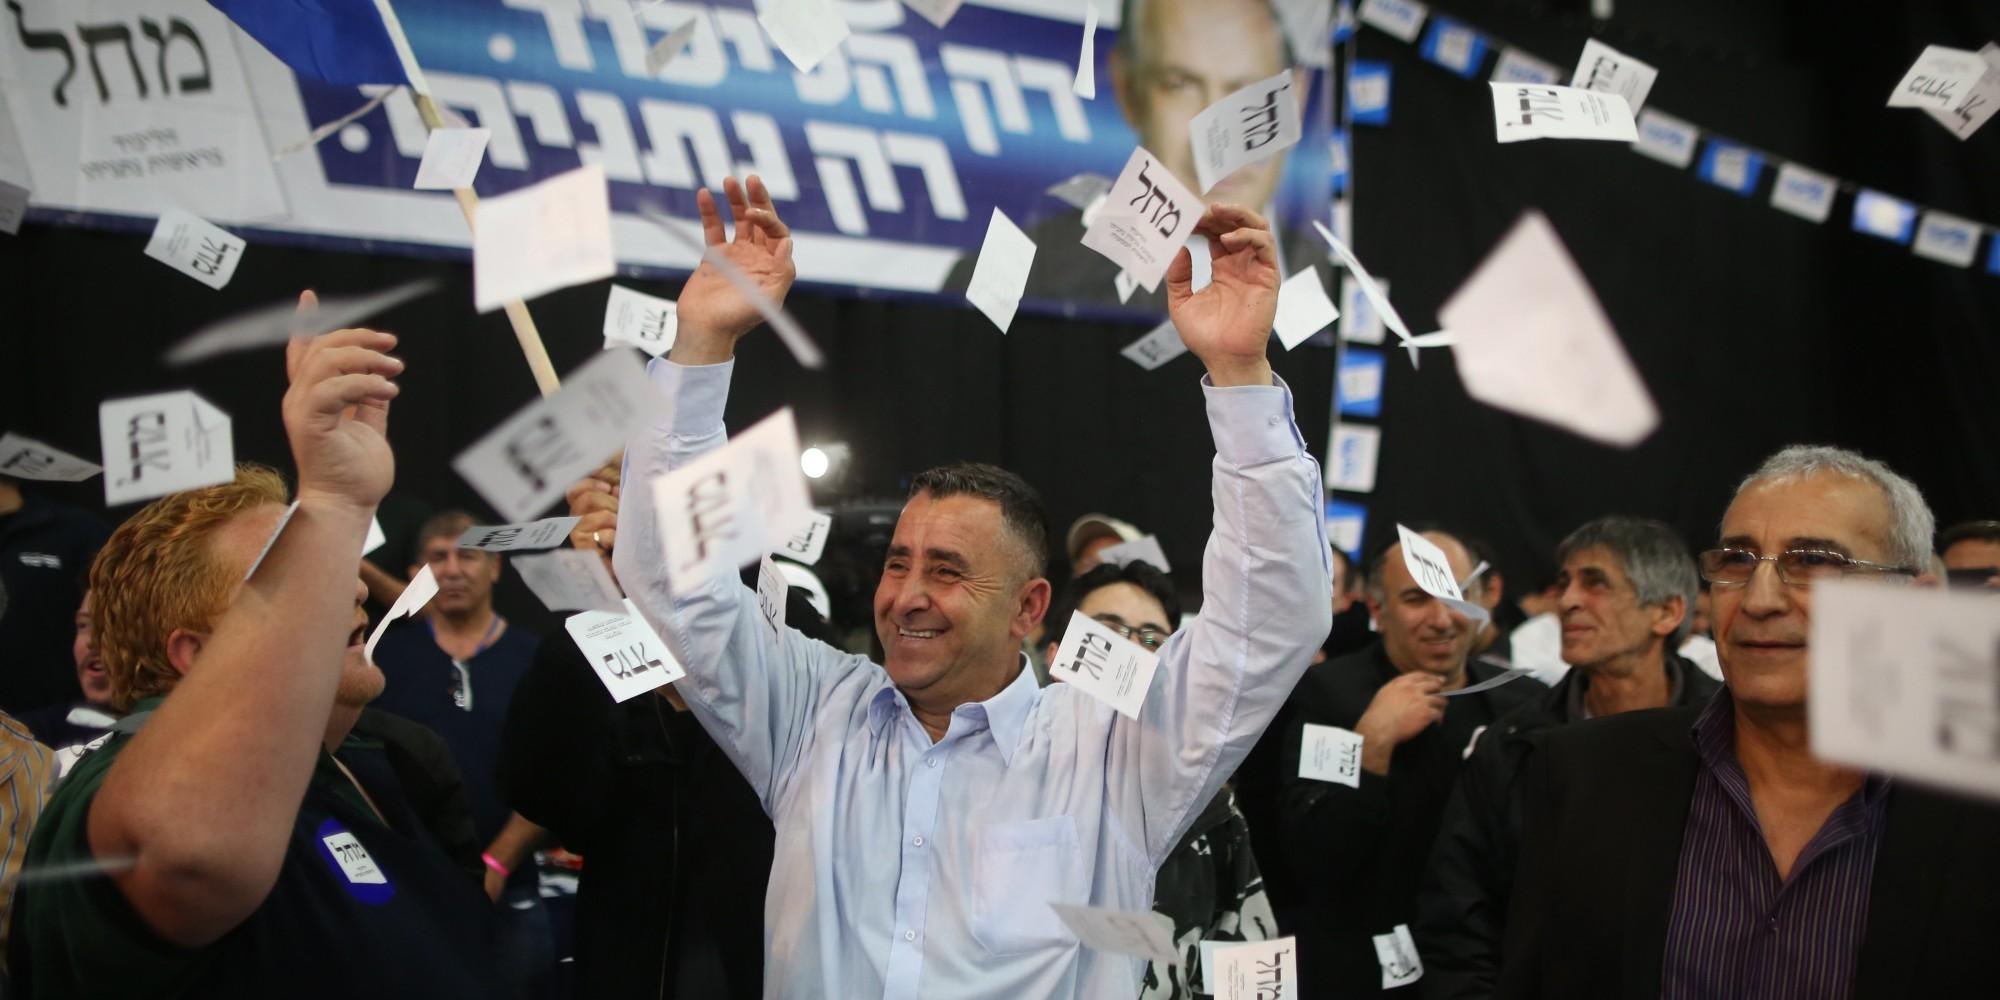 israel election - HD2000×1000